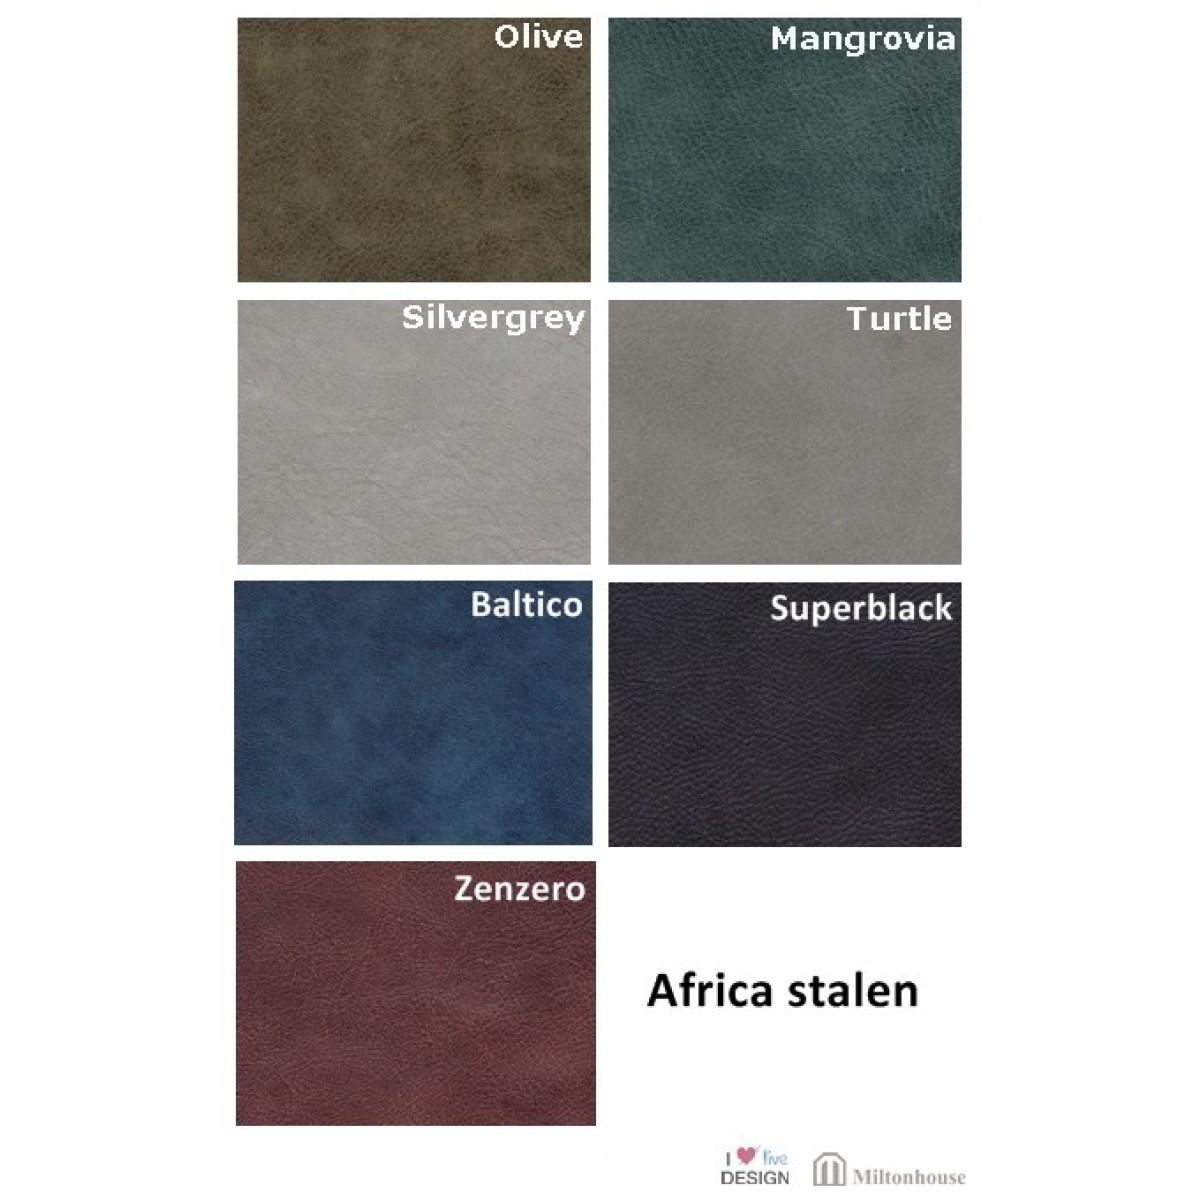 stalen-africa-leder